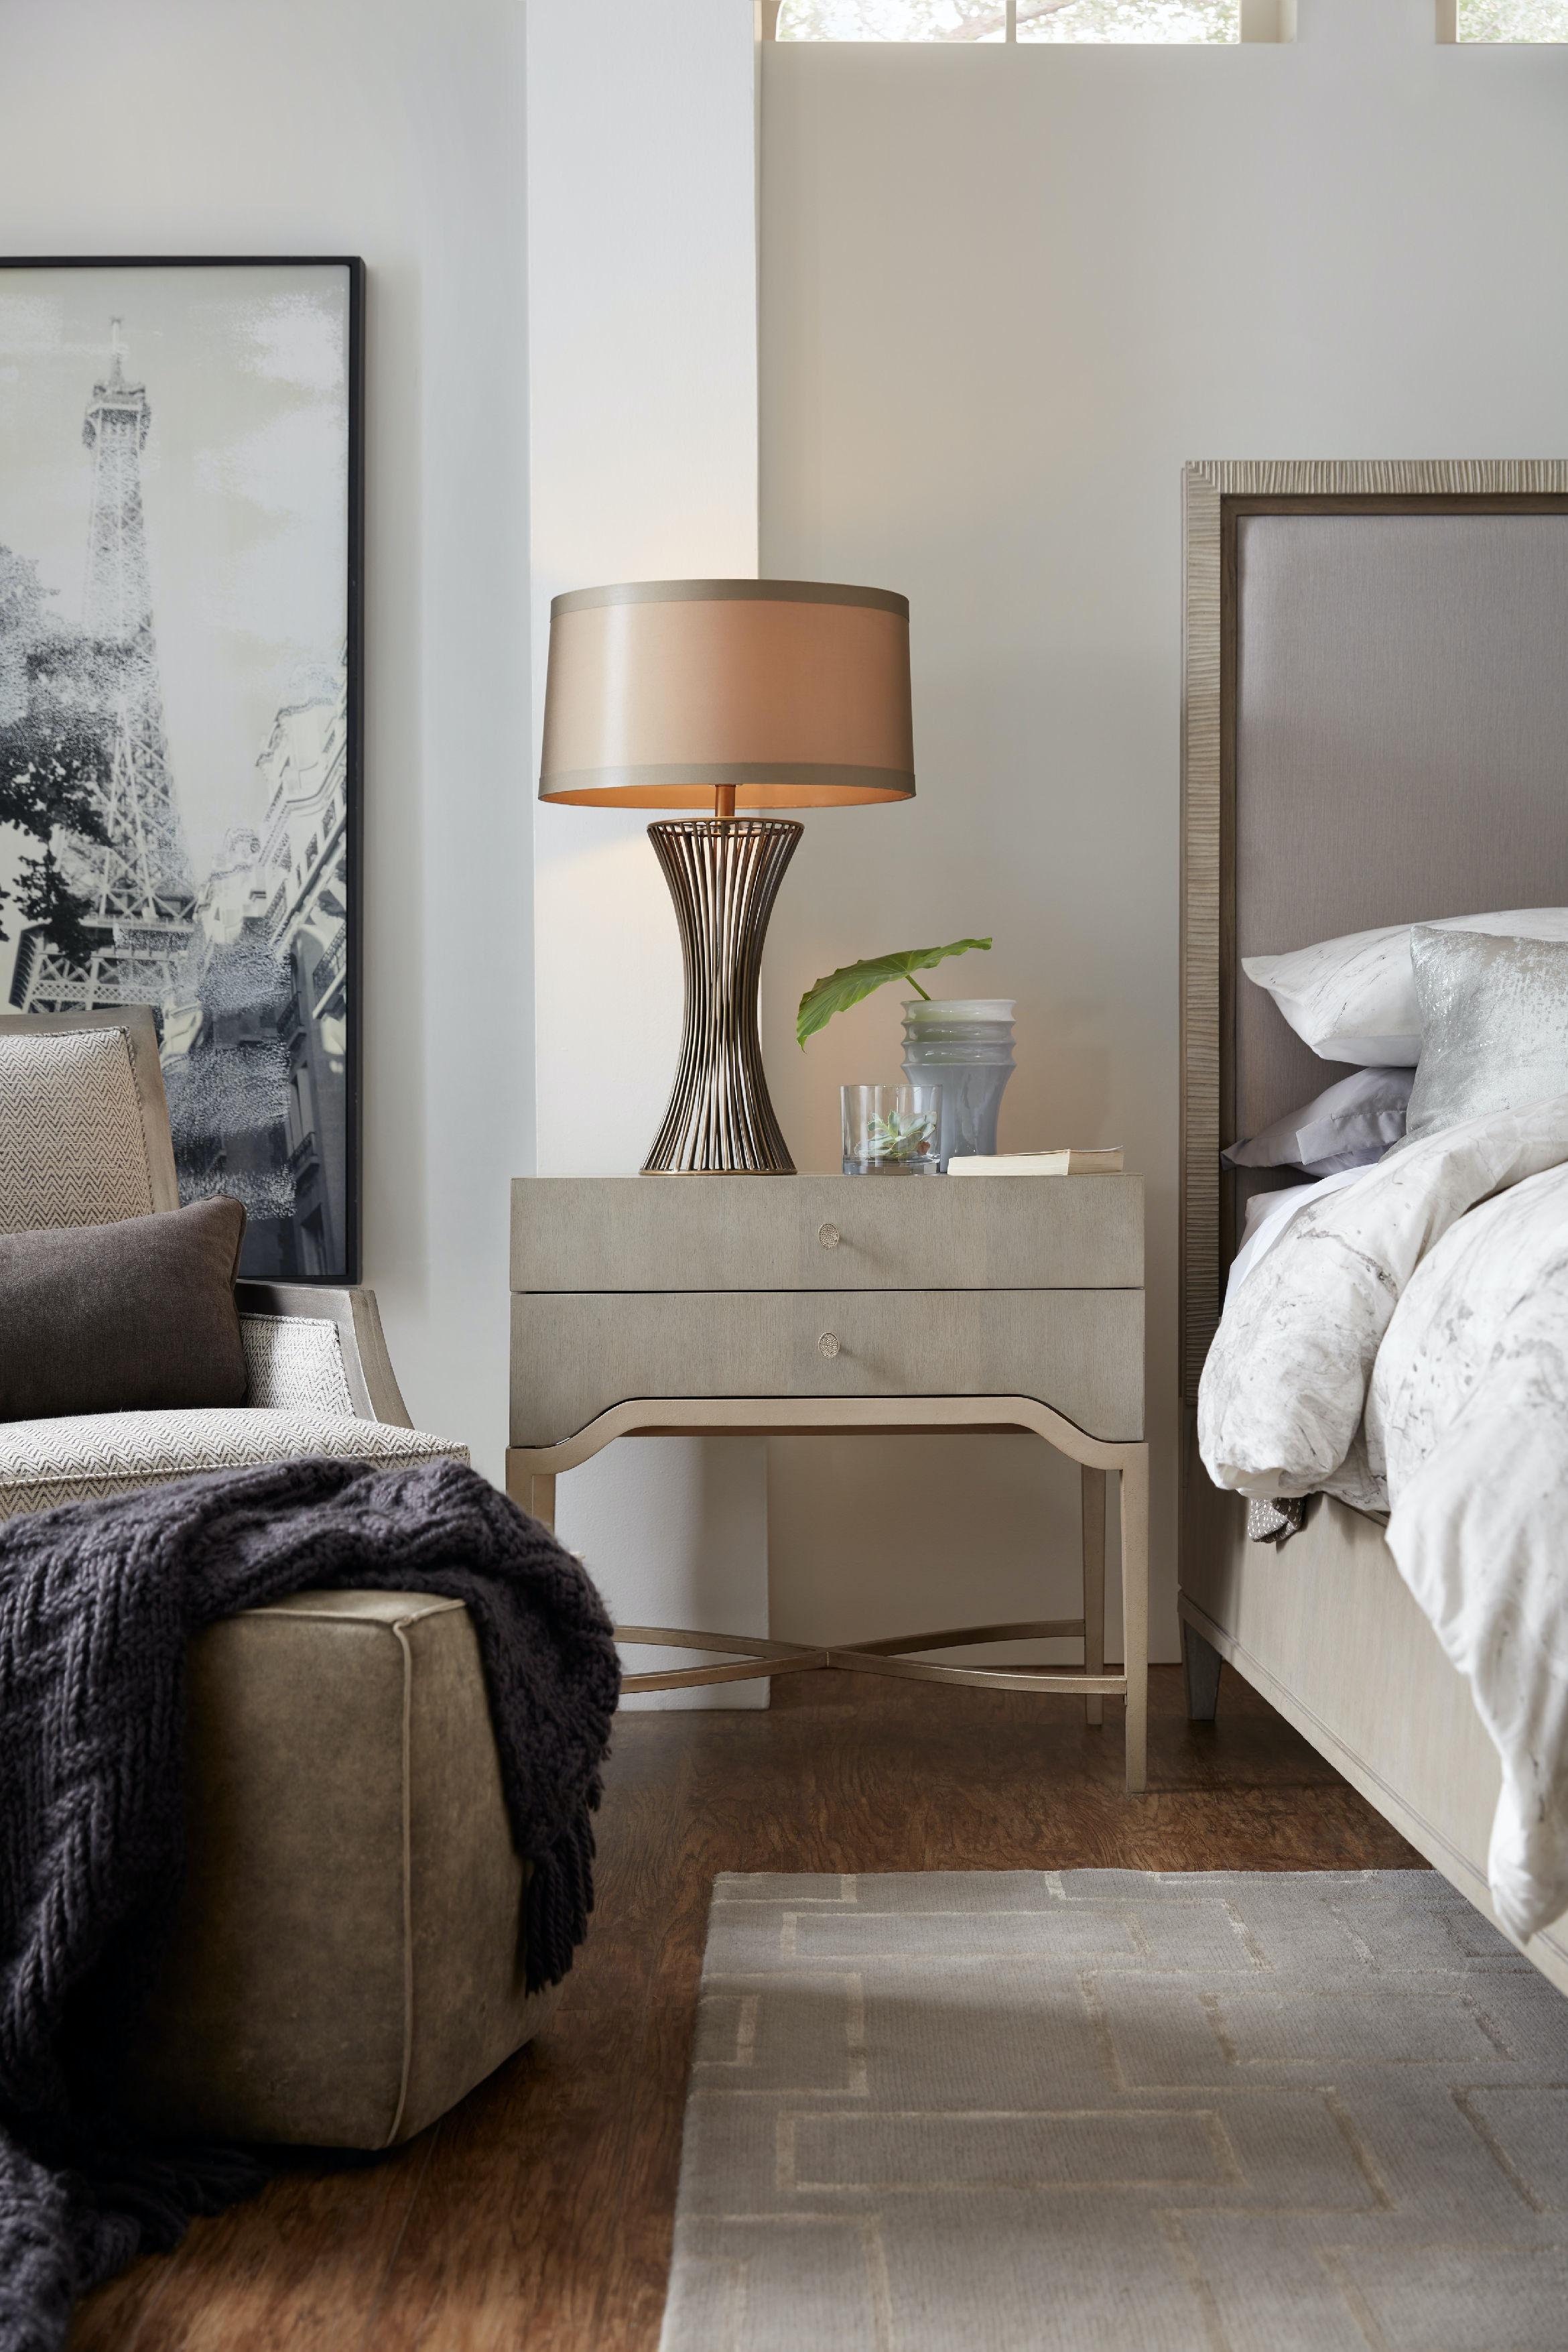 ltlt previous modular bedroom furniture. hooker furniture elixir twodrawer nightstand 599090016ltwd ltlt previous modular bedroom